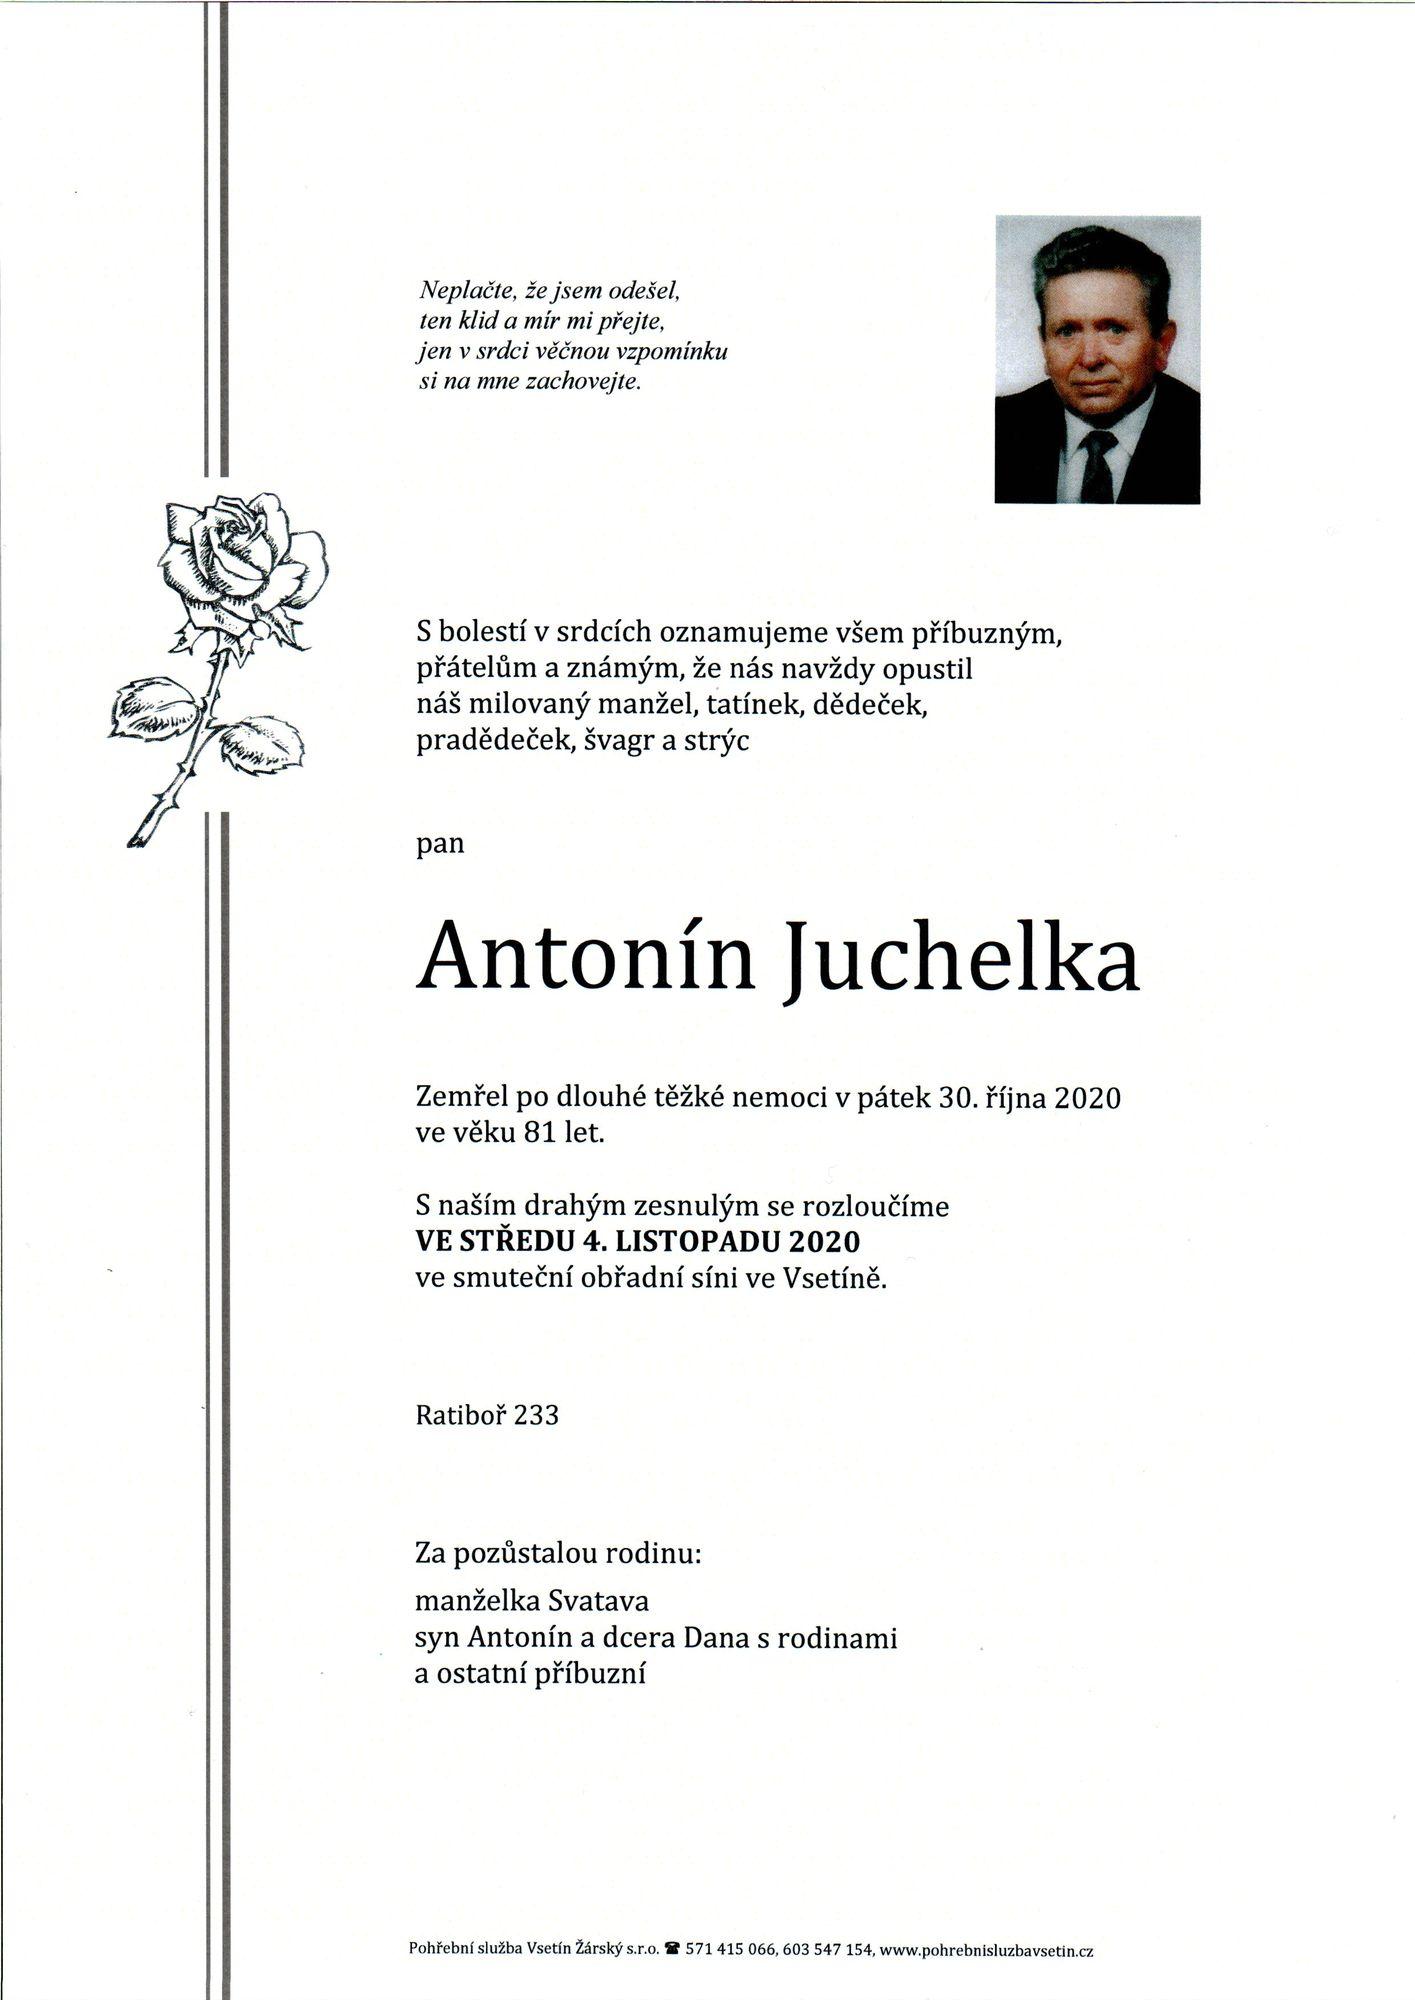 Antonín Juchelka